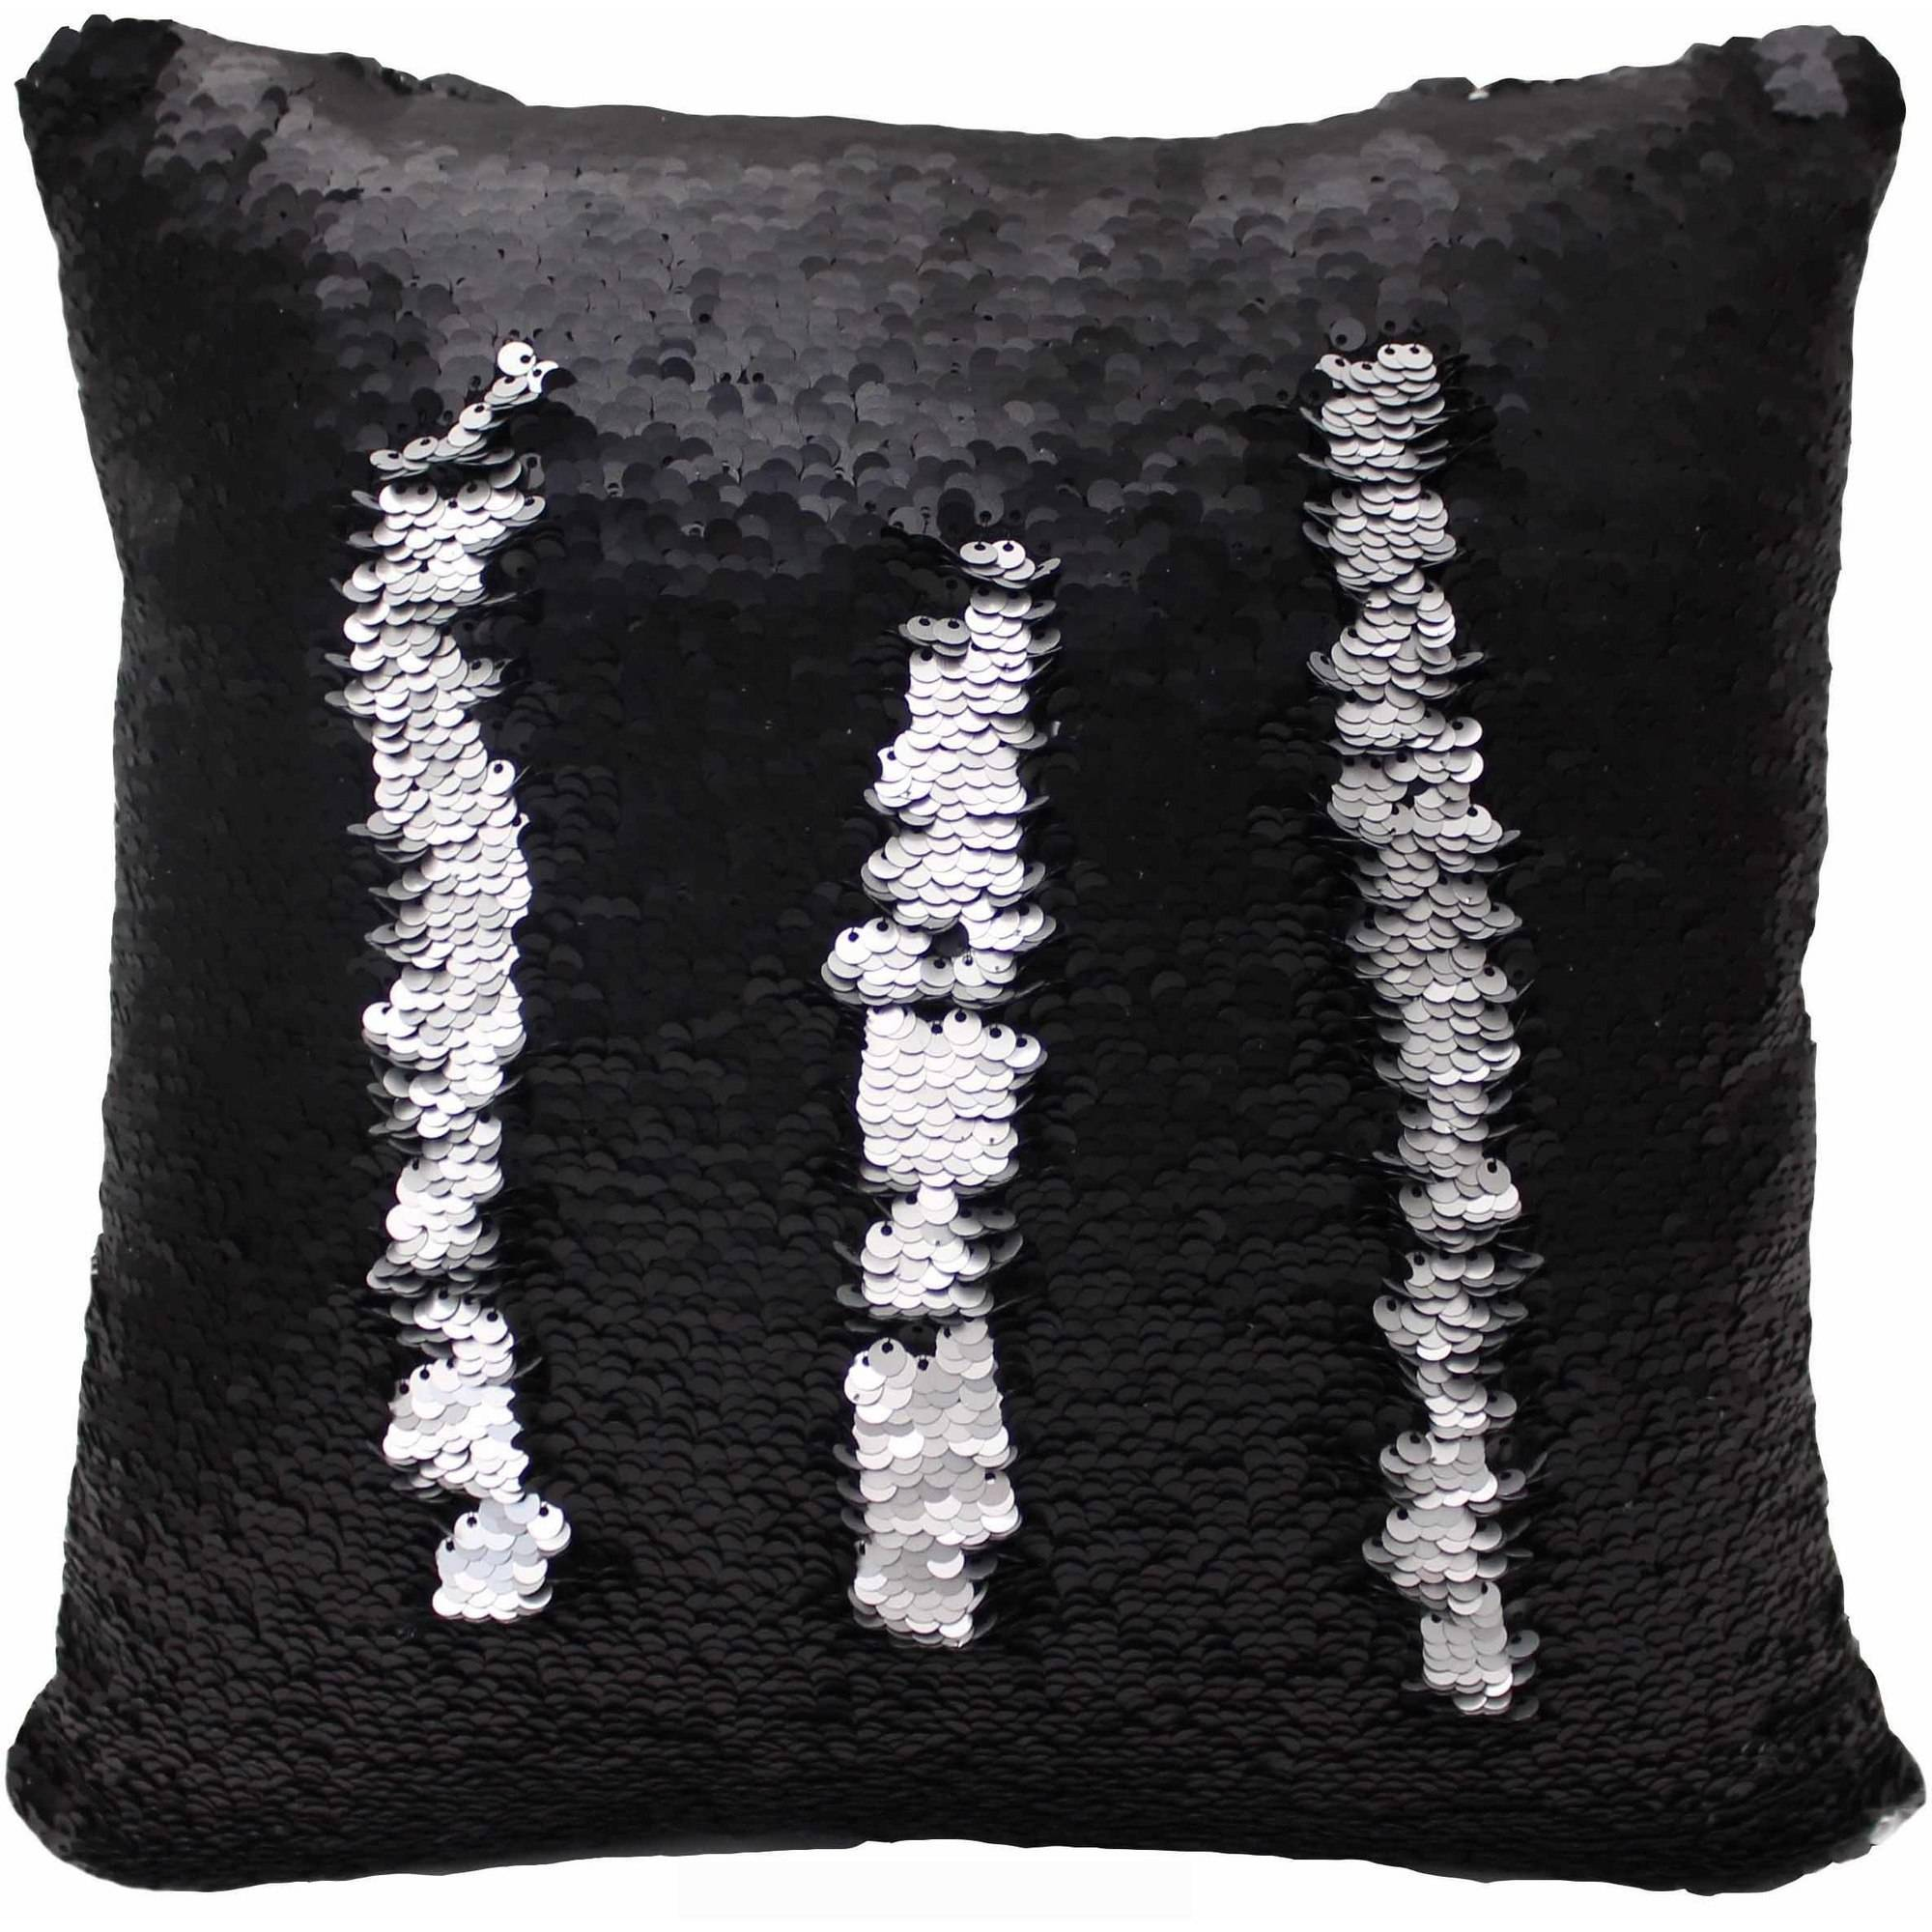 Posh Home Sequined Mermaid Decorative Pillow - Walmart.com